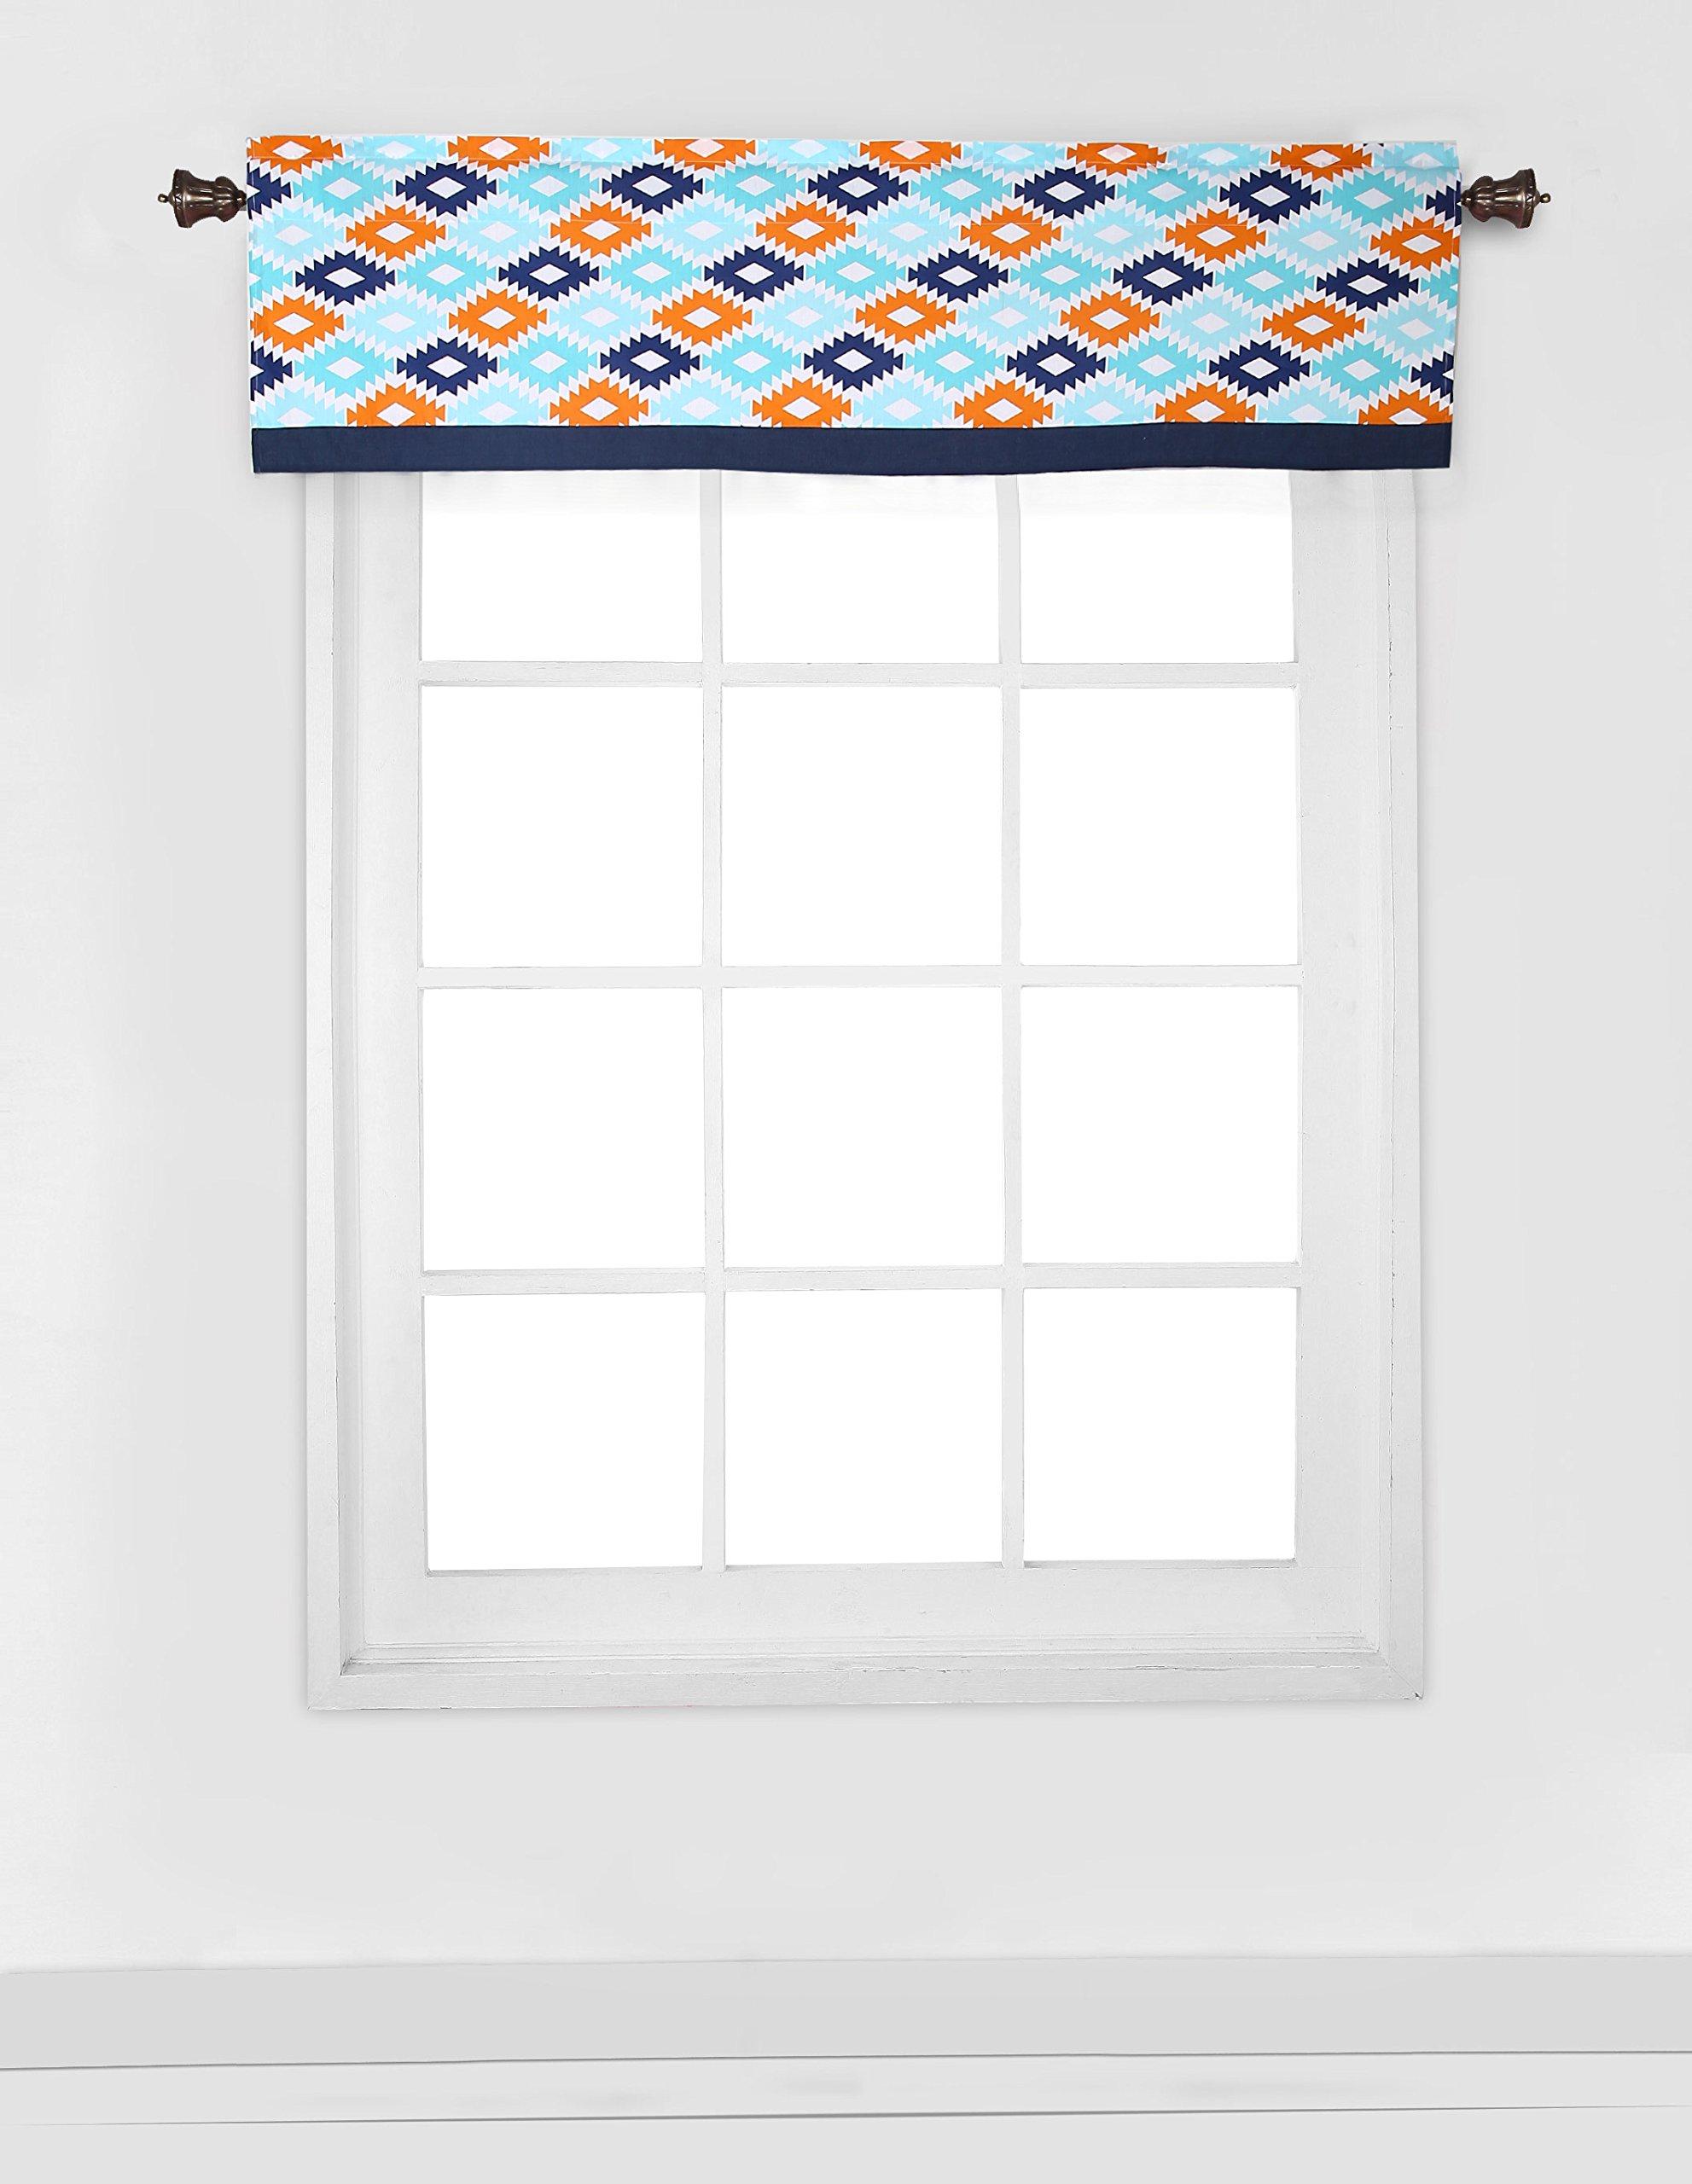 Bacati Liam Aztec Window Valance, Aqua/Orange/Navy, 54 x 15'' by Bacati